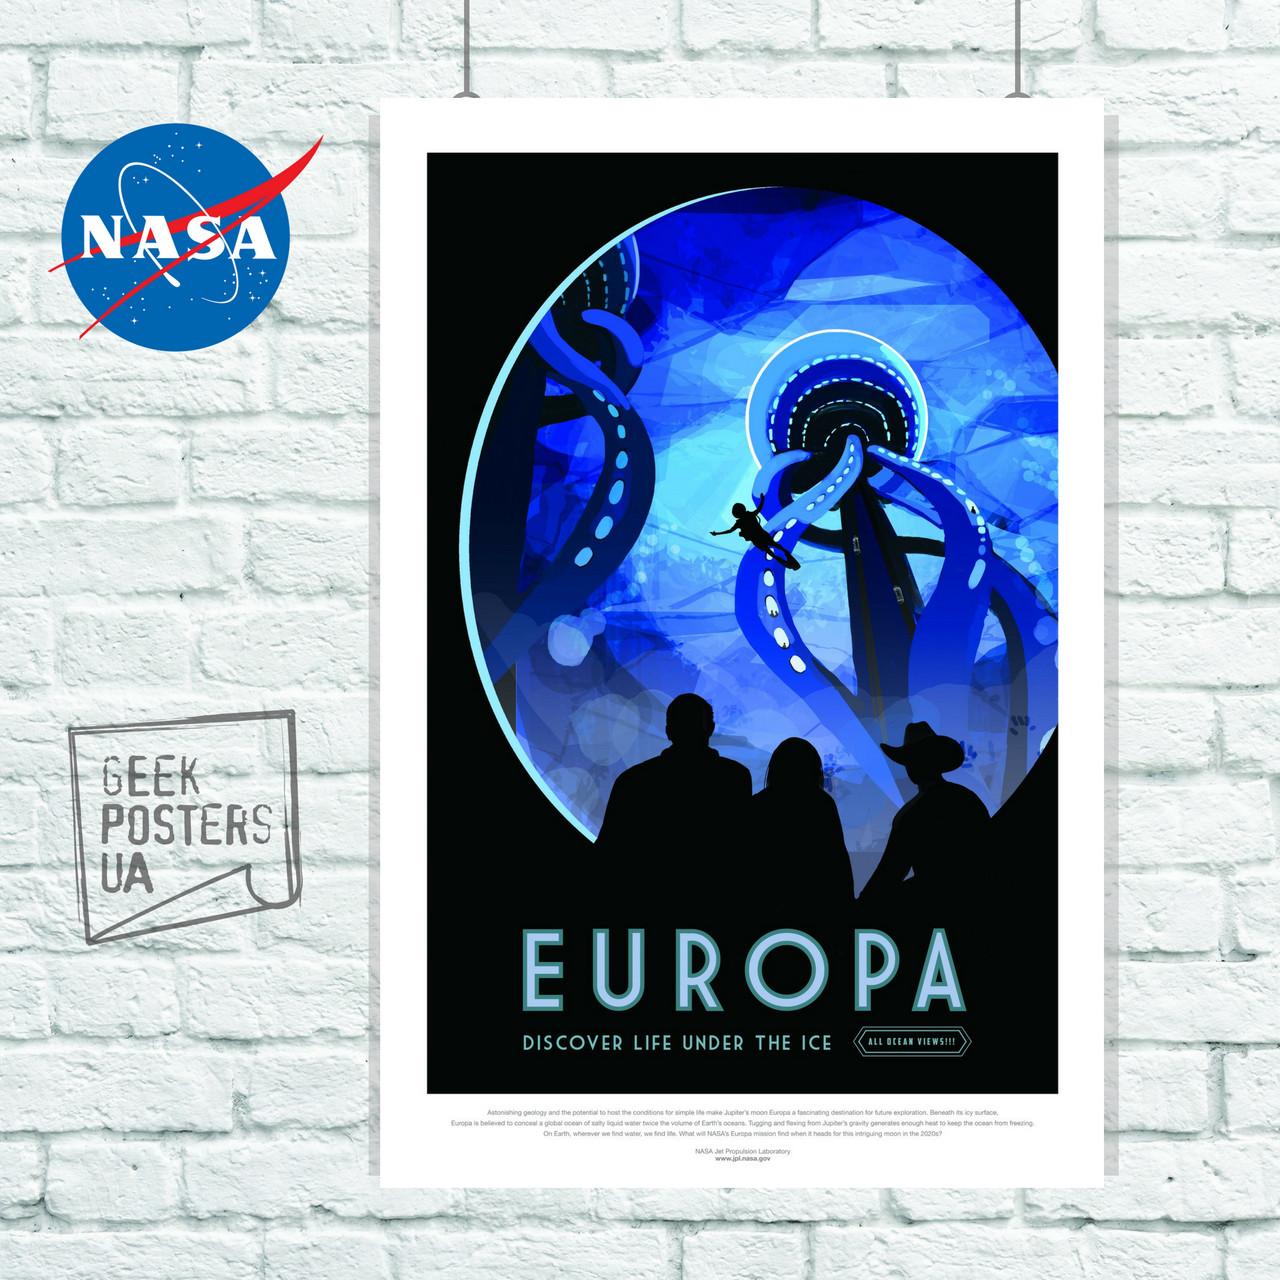 Постер НАСА, NASA, Europa, Европа. Размер 60x40см (A2). Глянцевая бумага